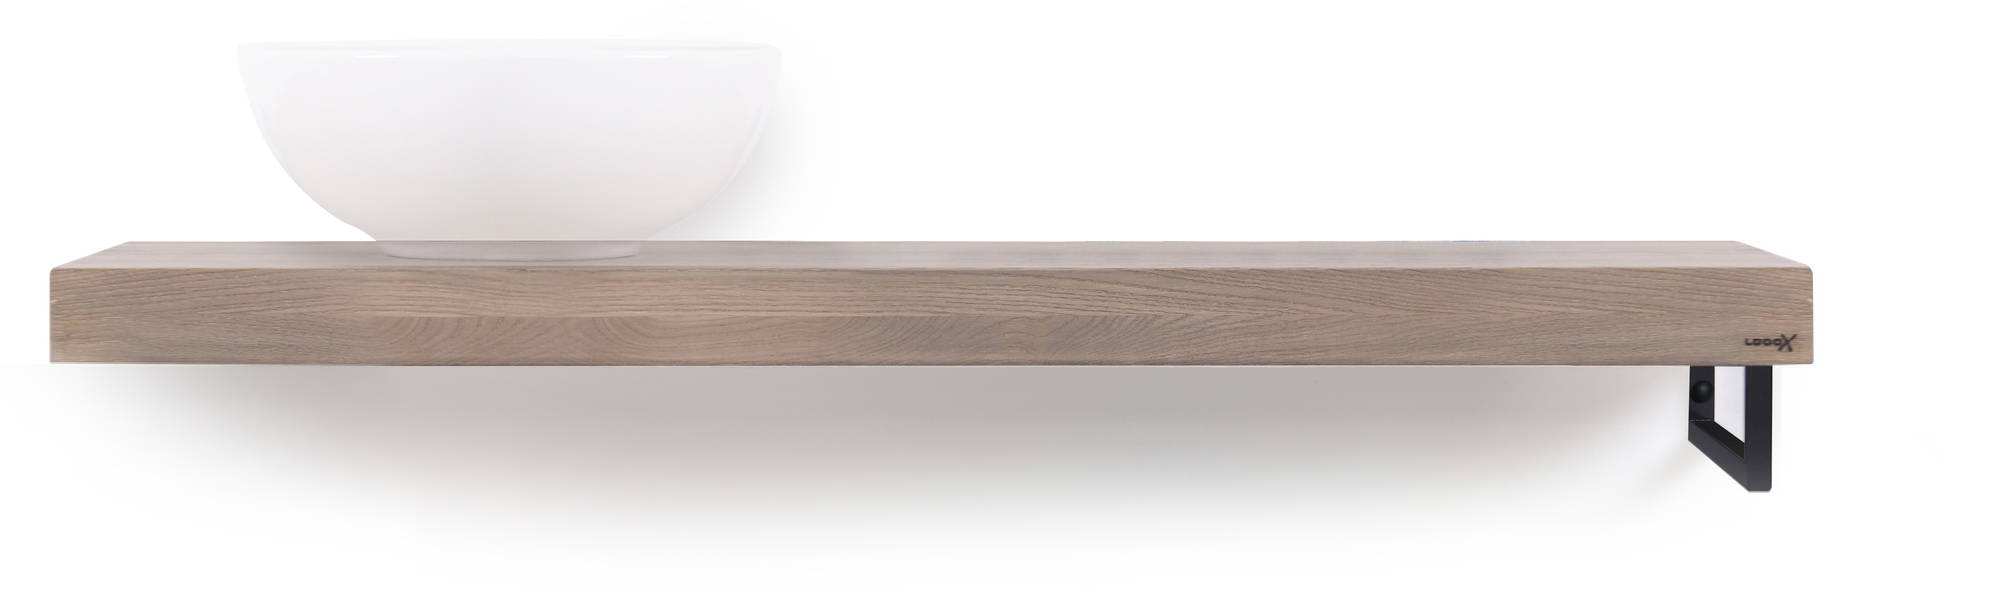 Looox Wooden Base Shelf Solo 120 cm Houder Rechts Old Grey/Mat Zwart